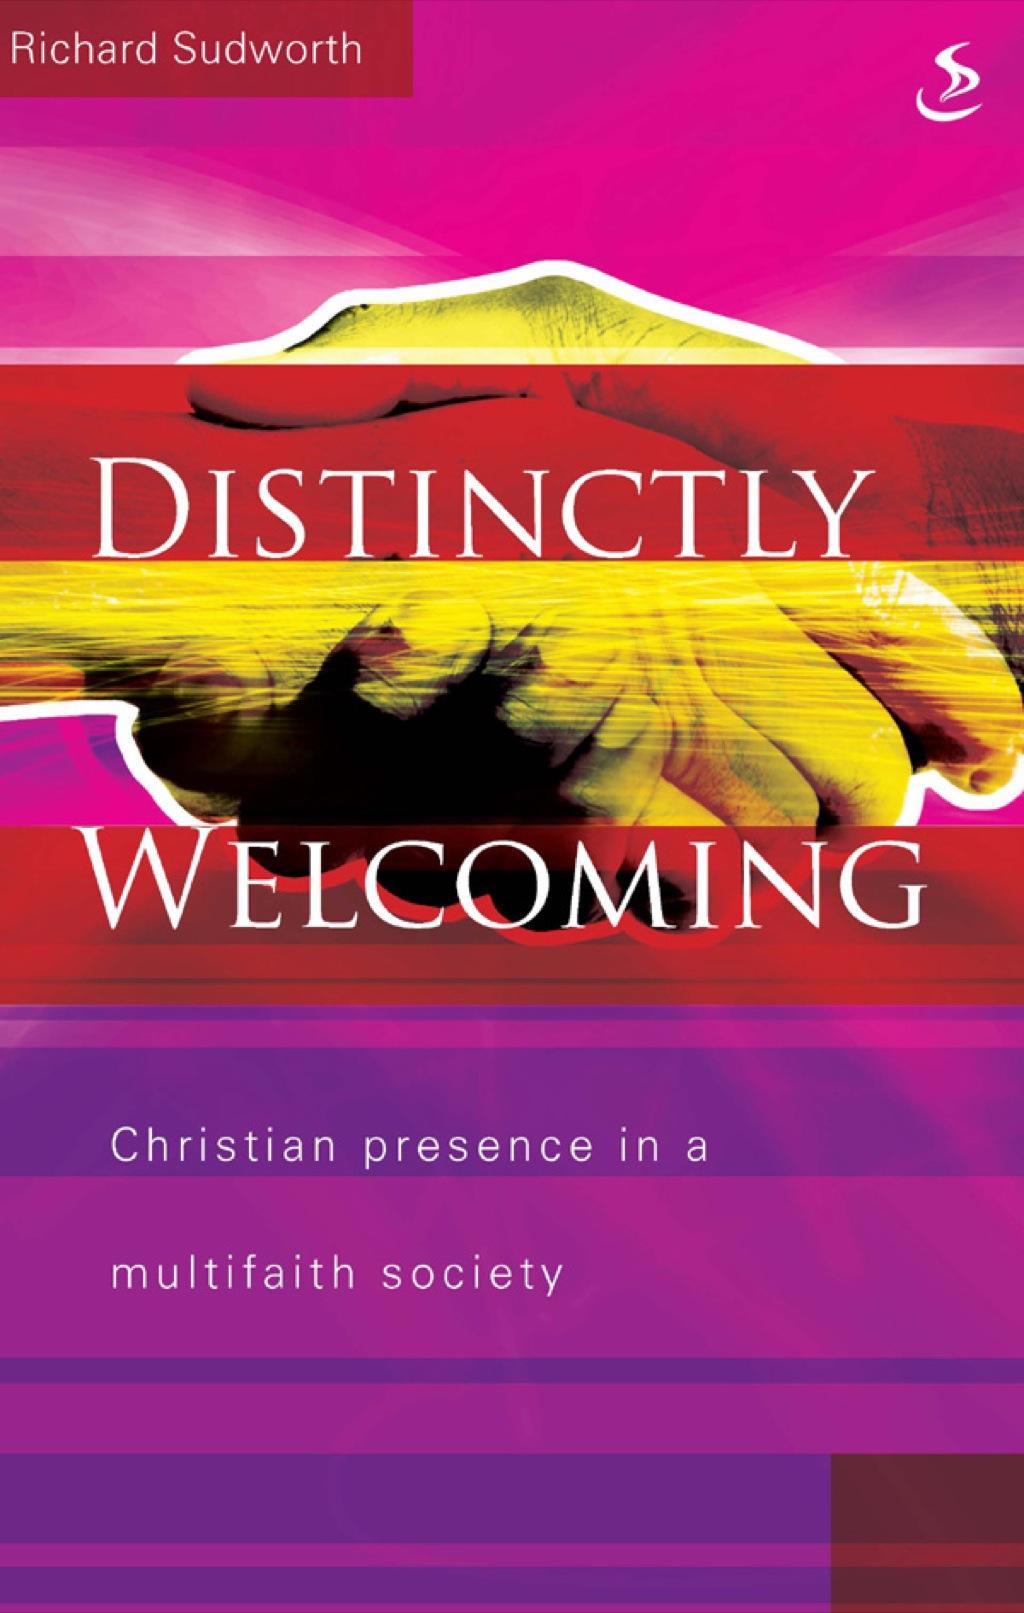 Distinctly welcoming (eBook)